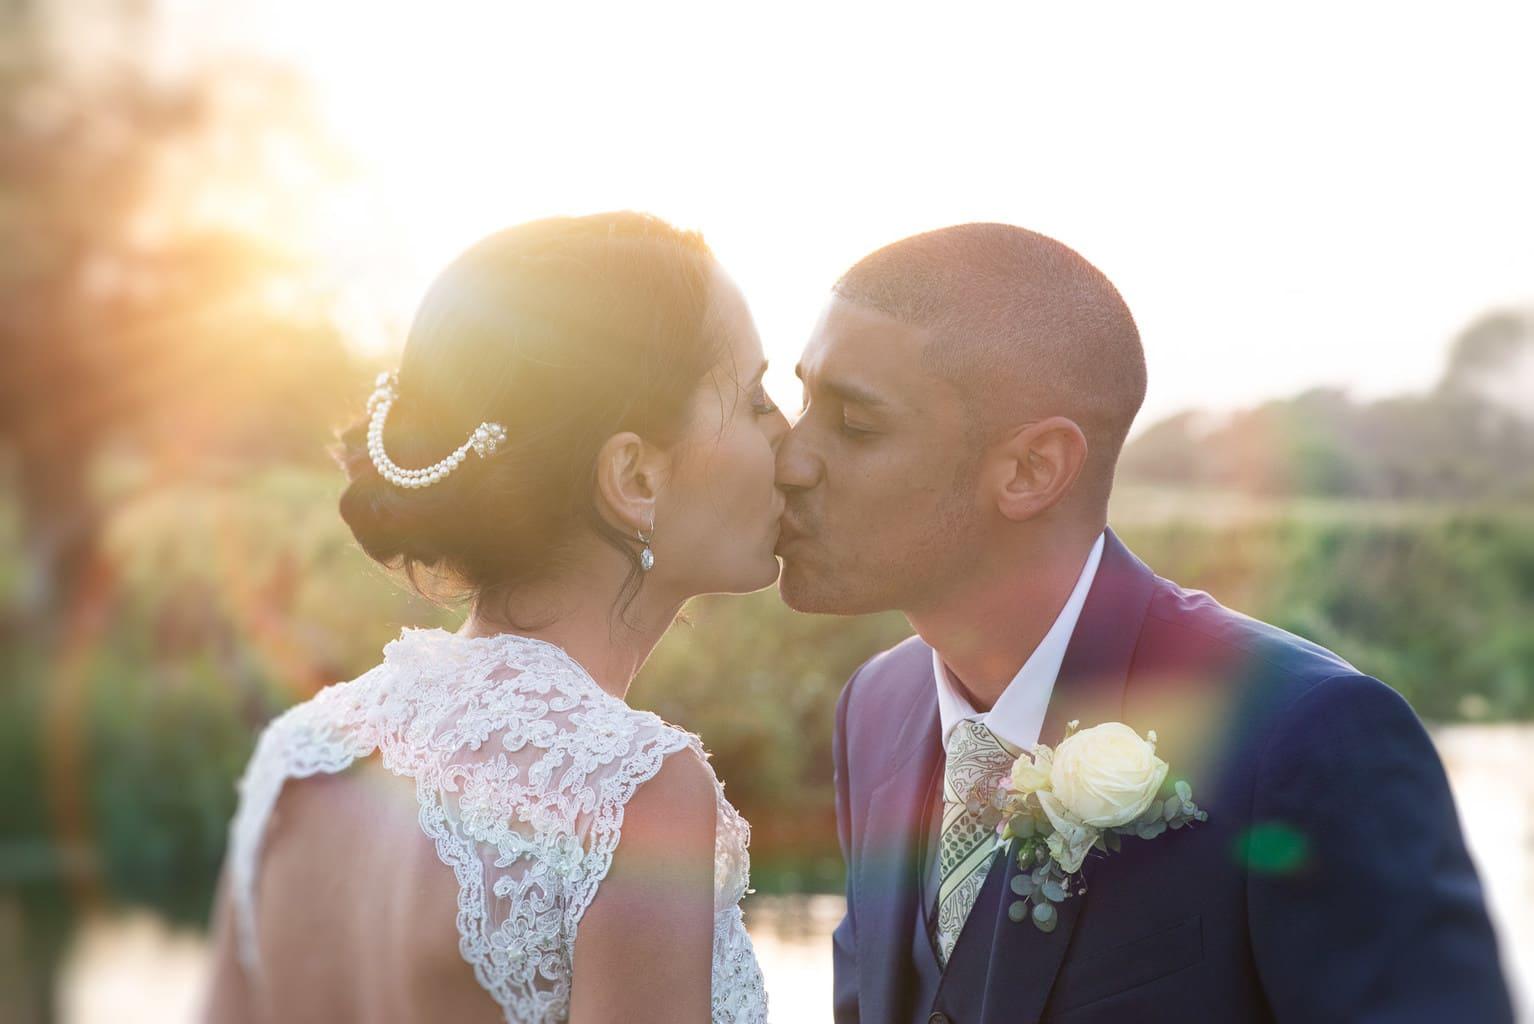 wedding photo at Sopley Mill, Christchurch